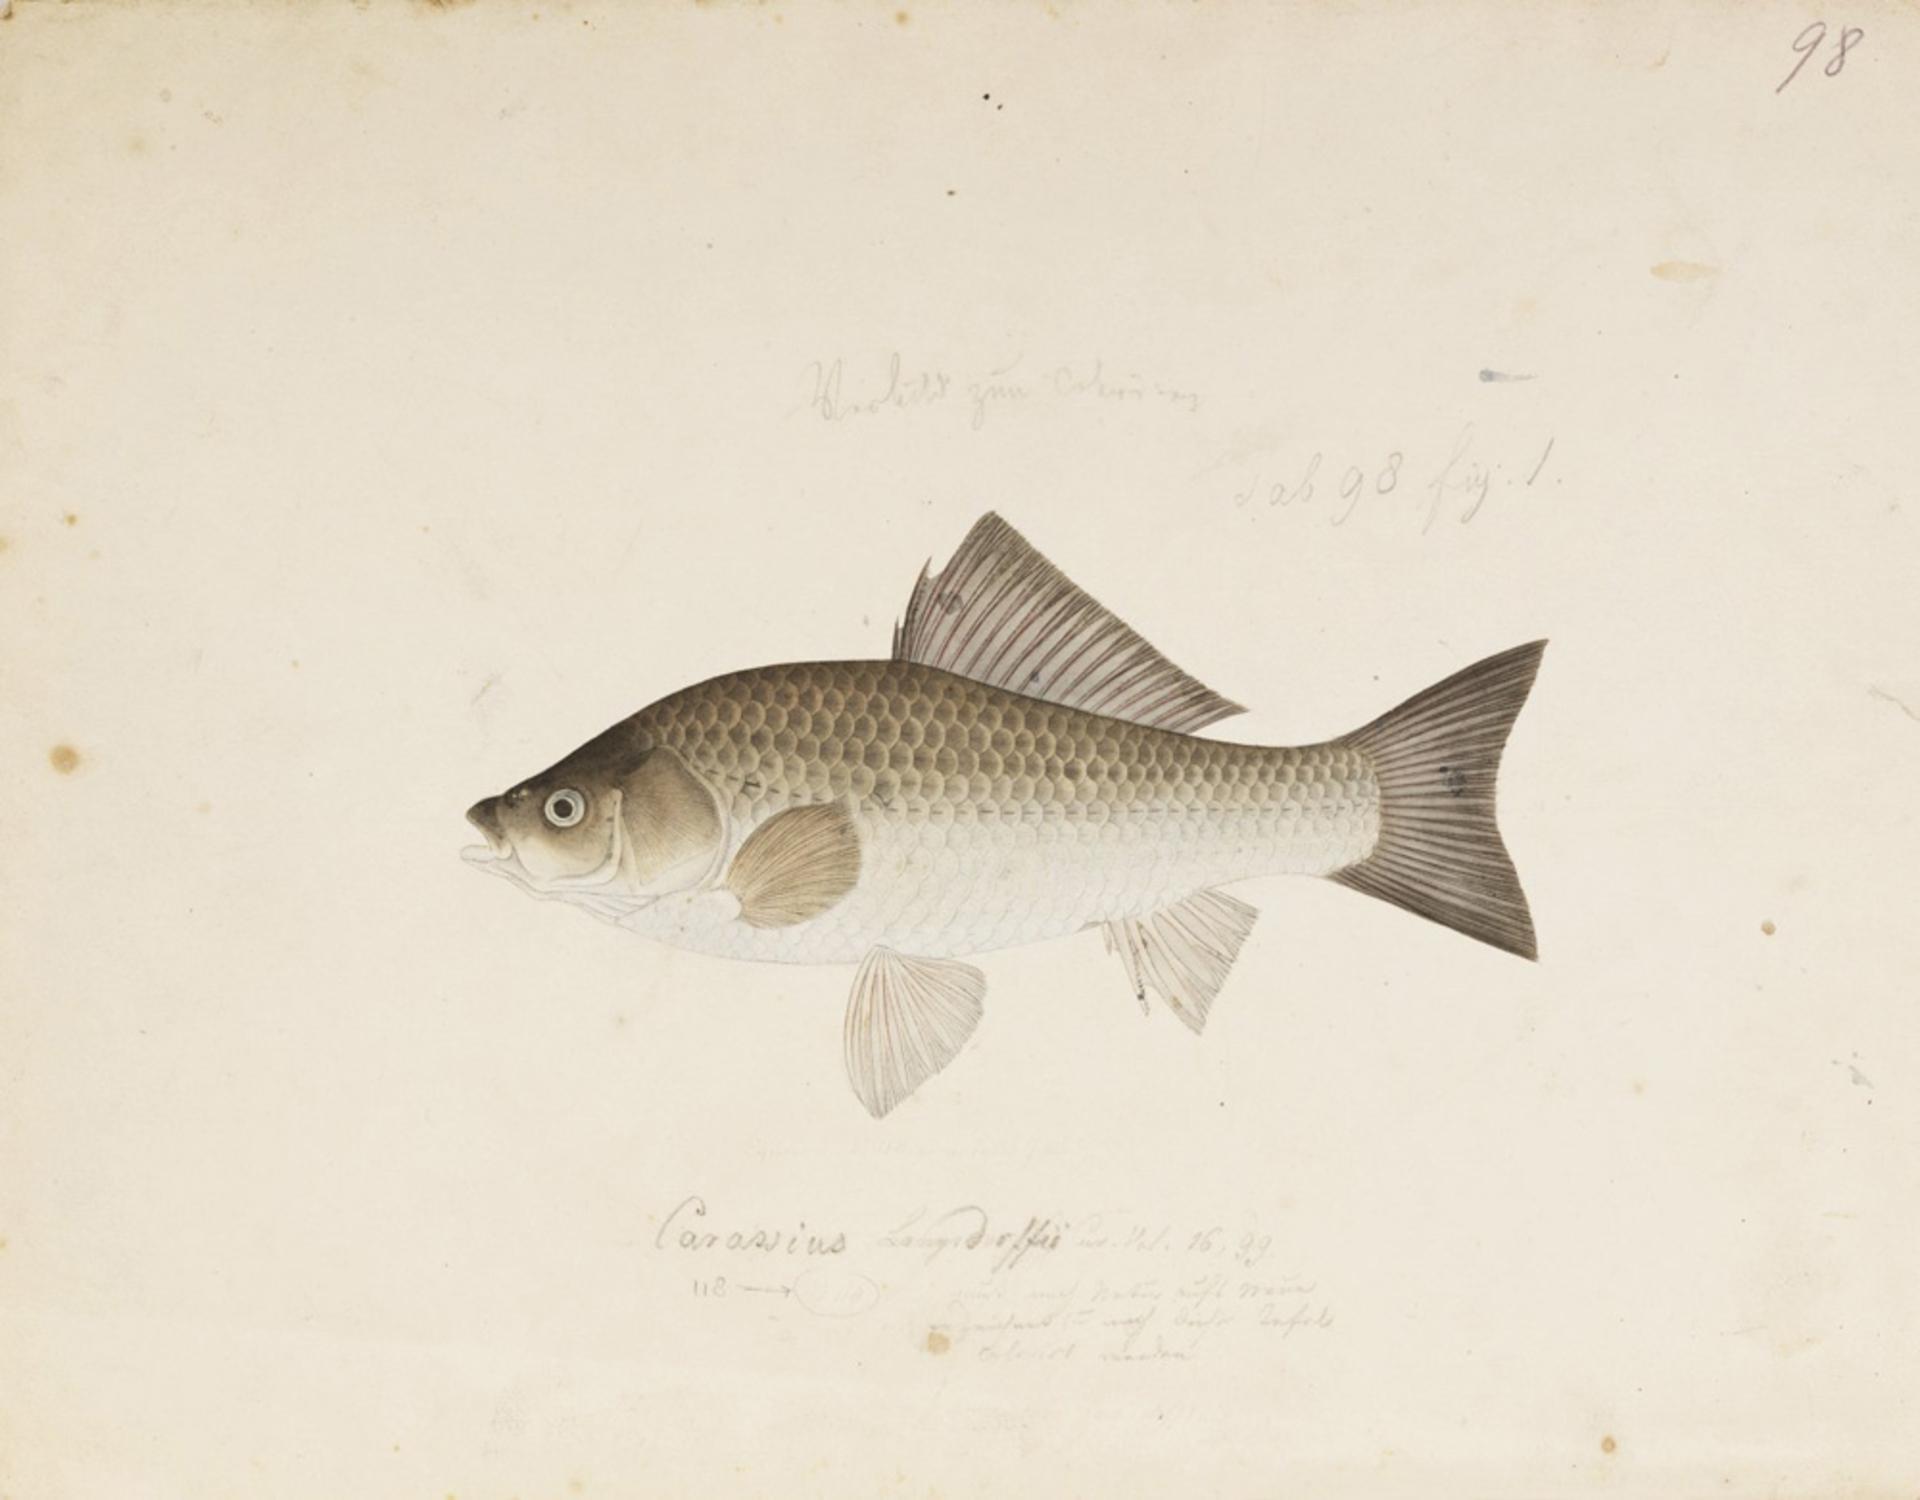 RMNH.ART.131 | Carassius auratus langsdorfi